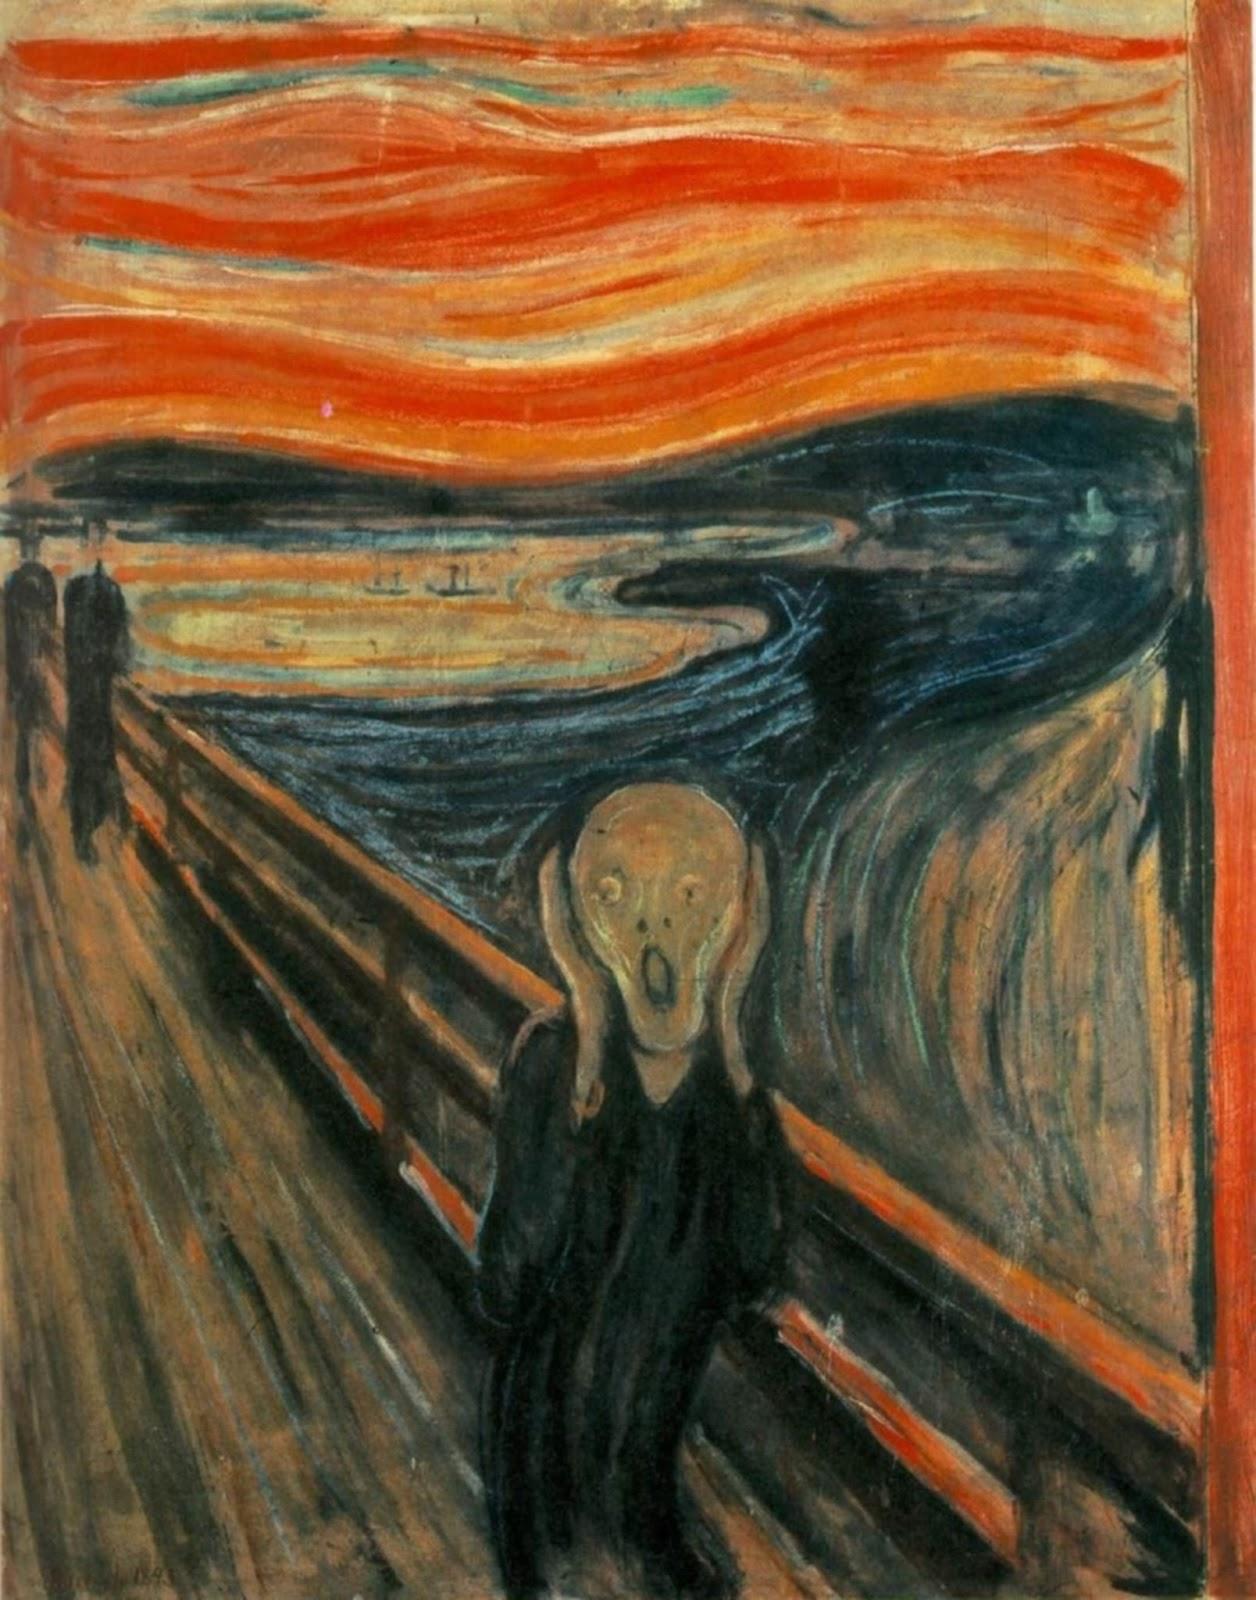 O Grito - Edvard Munch - A terceira pintura mais famosa do mundo